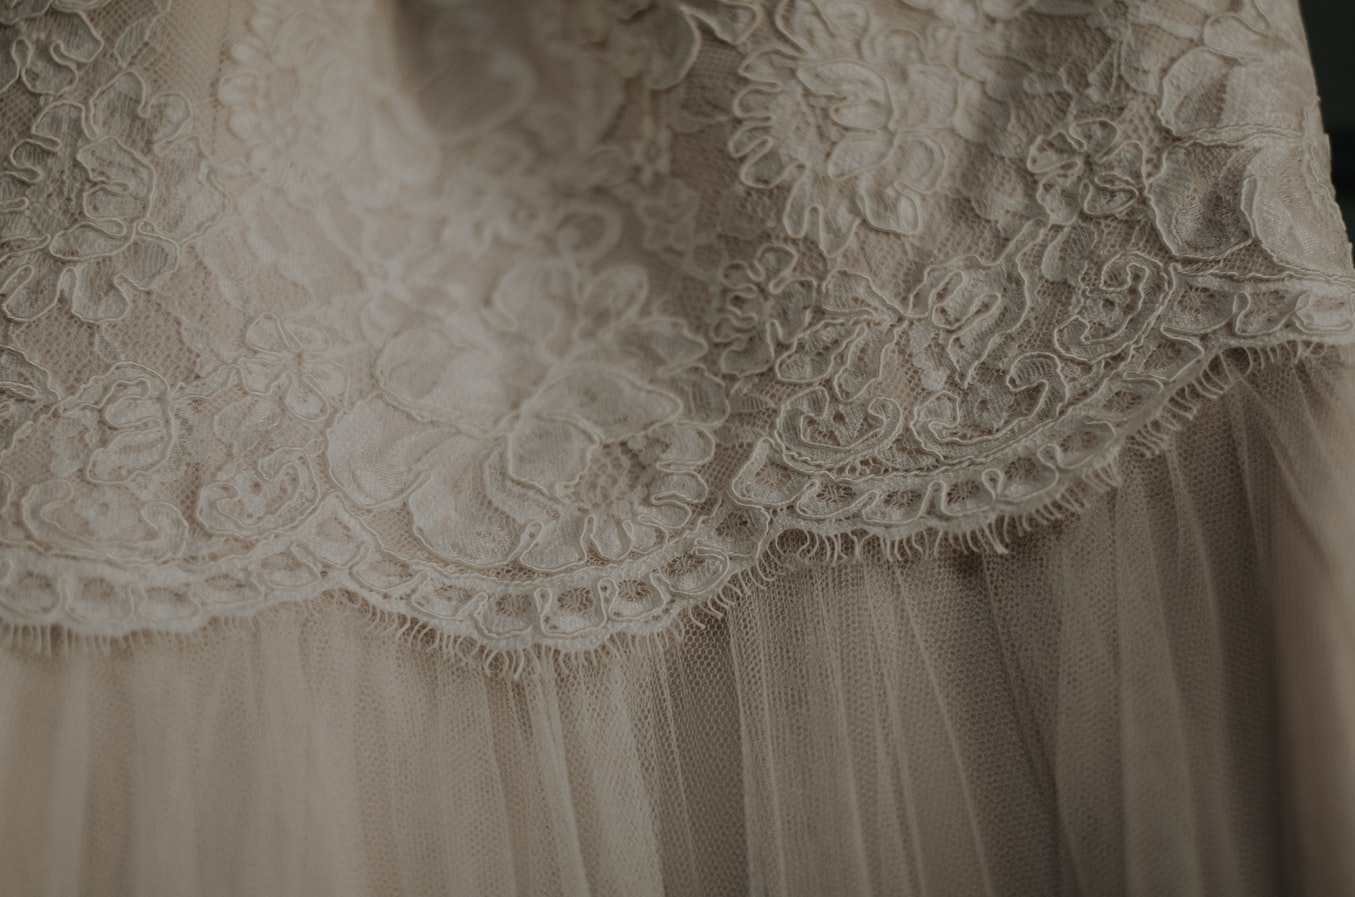 preserving a wedding dress